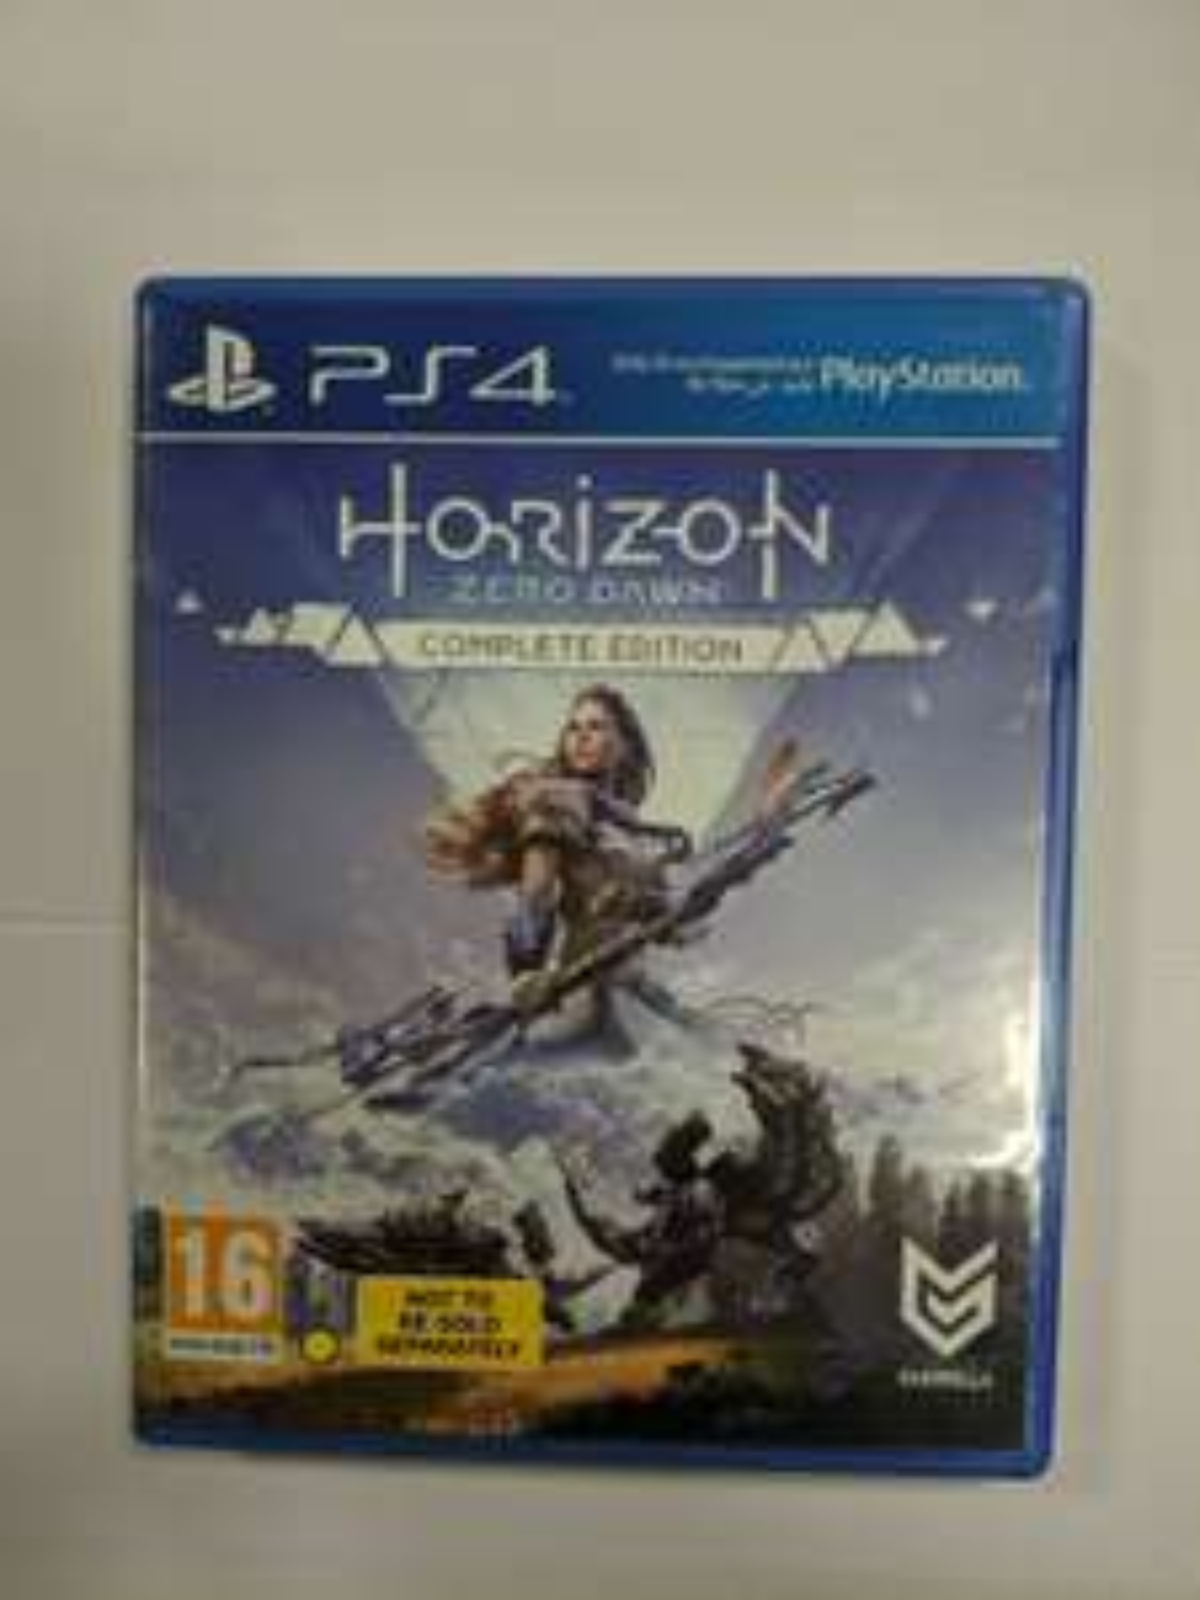 Horizon Zero Dawn Complete Edition (Bundle) PS4 USED@Evergameuk ebay